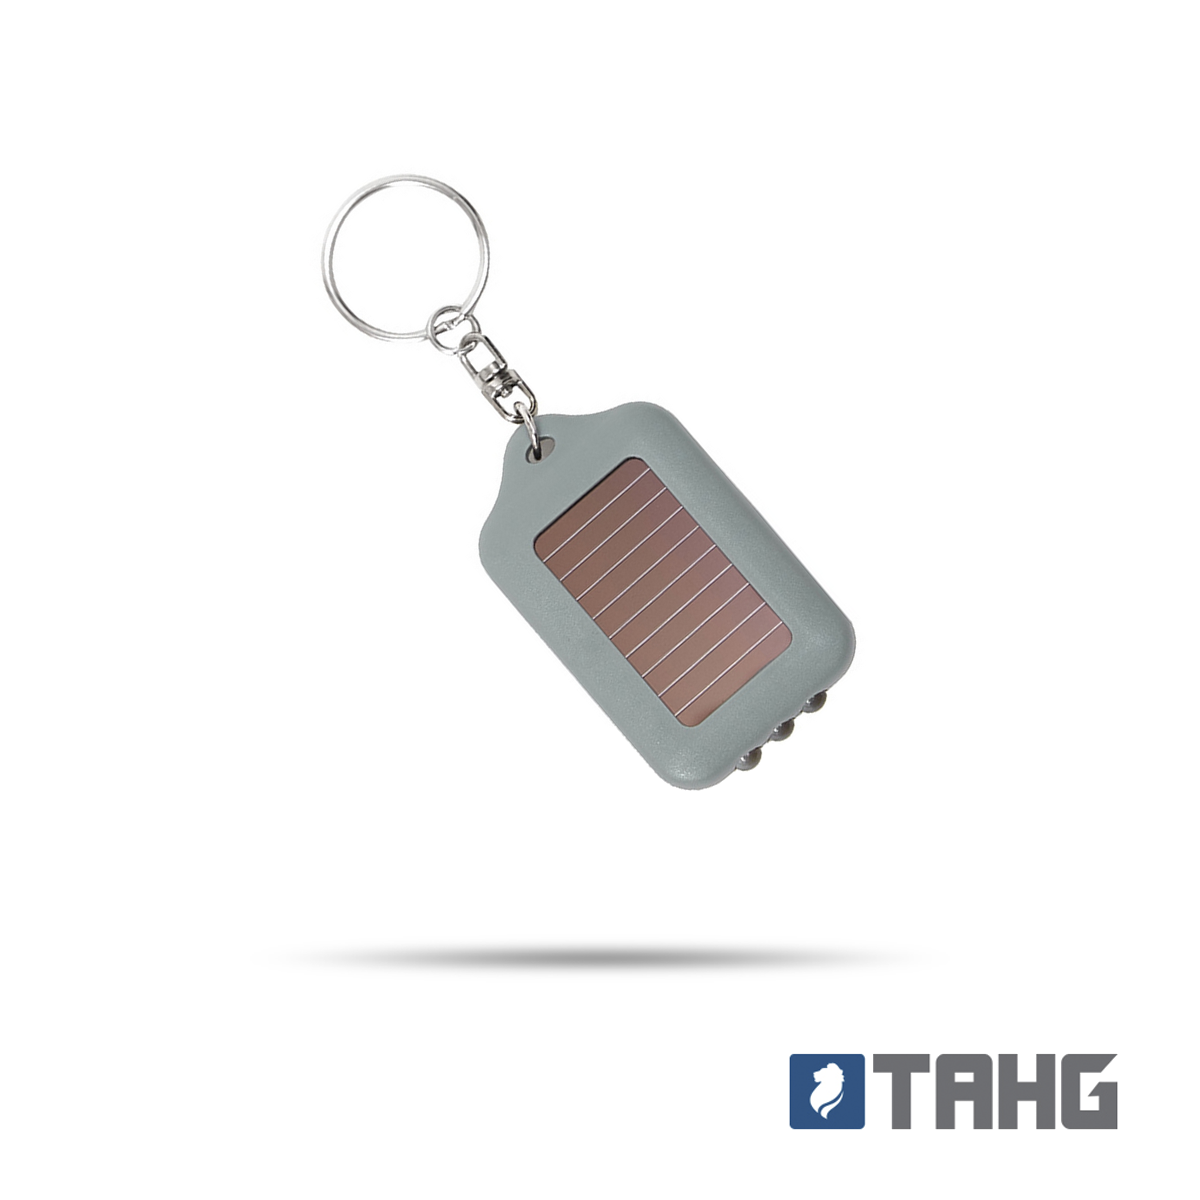 Llavero Solar Key - Luz LED